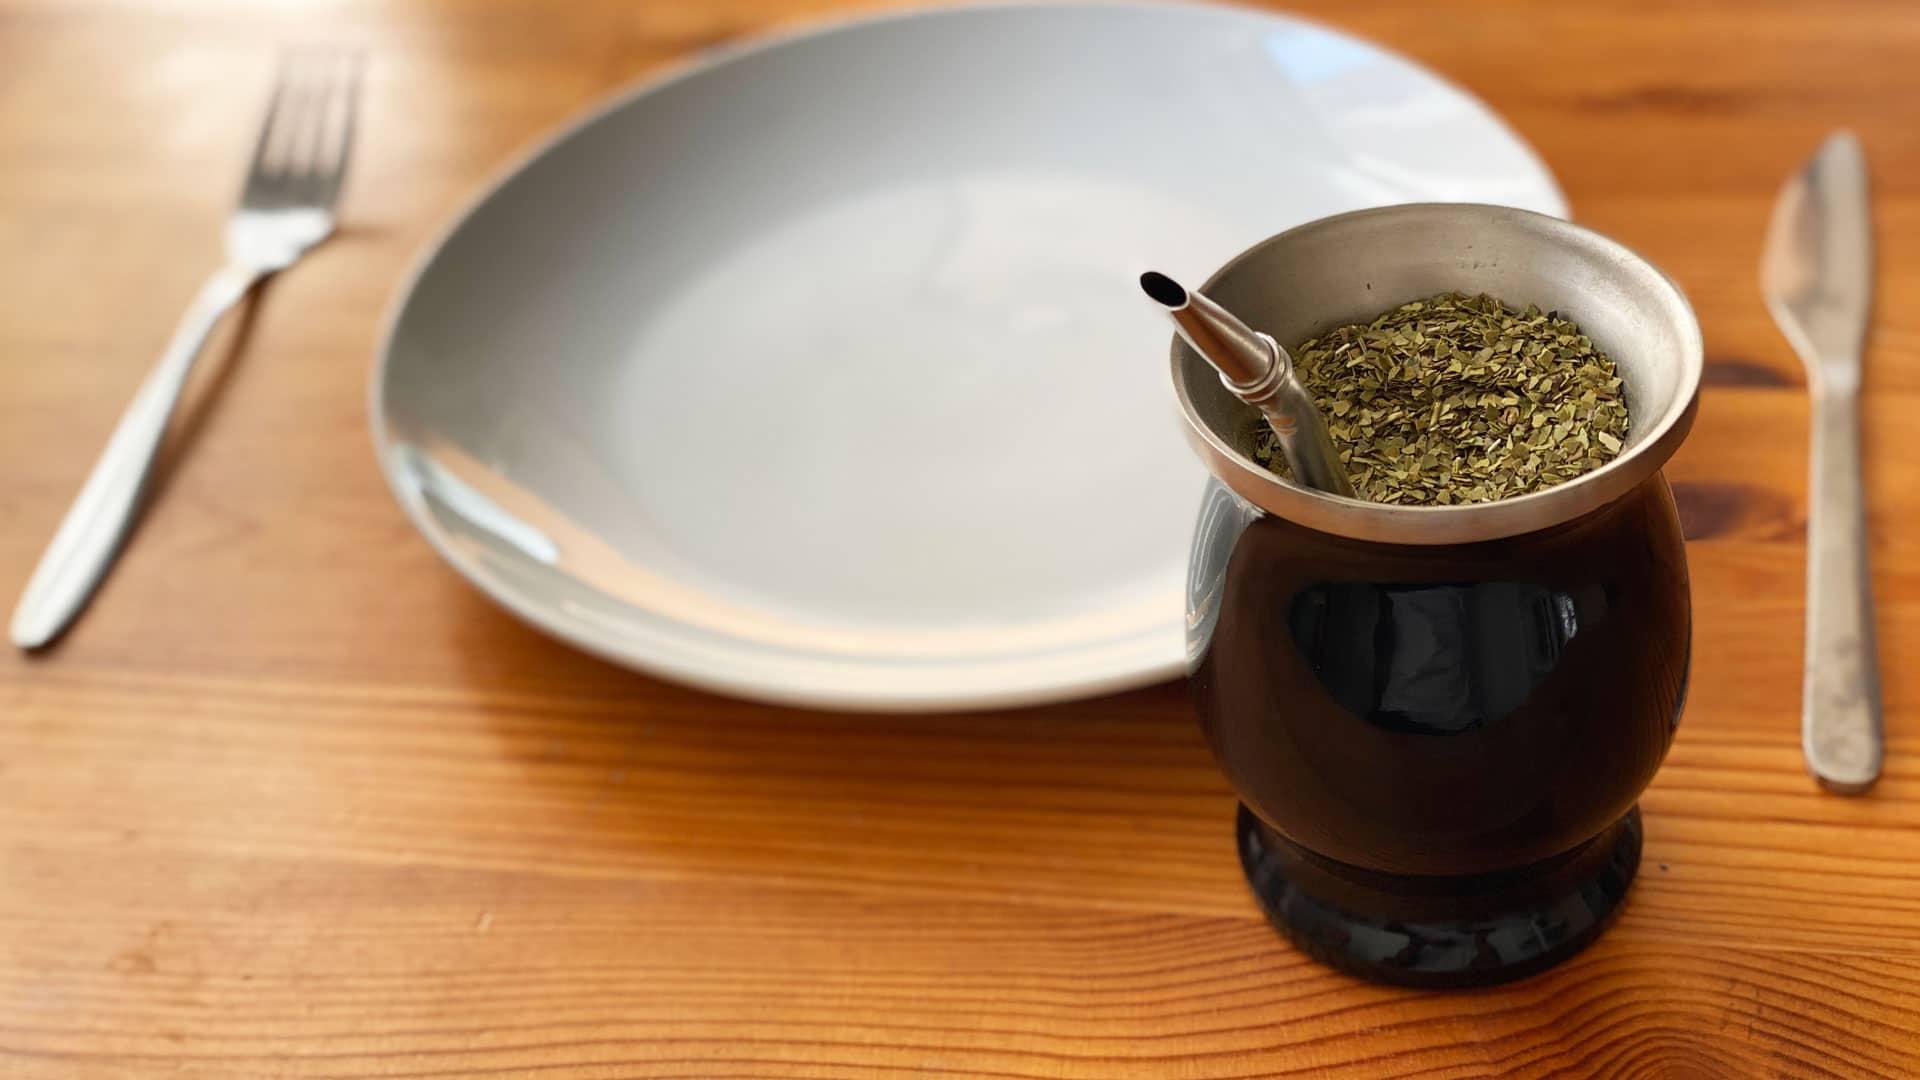 Kalebasse mit Mate und leeres Teller